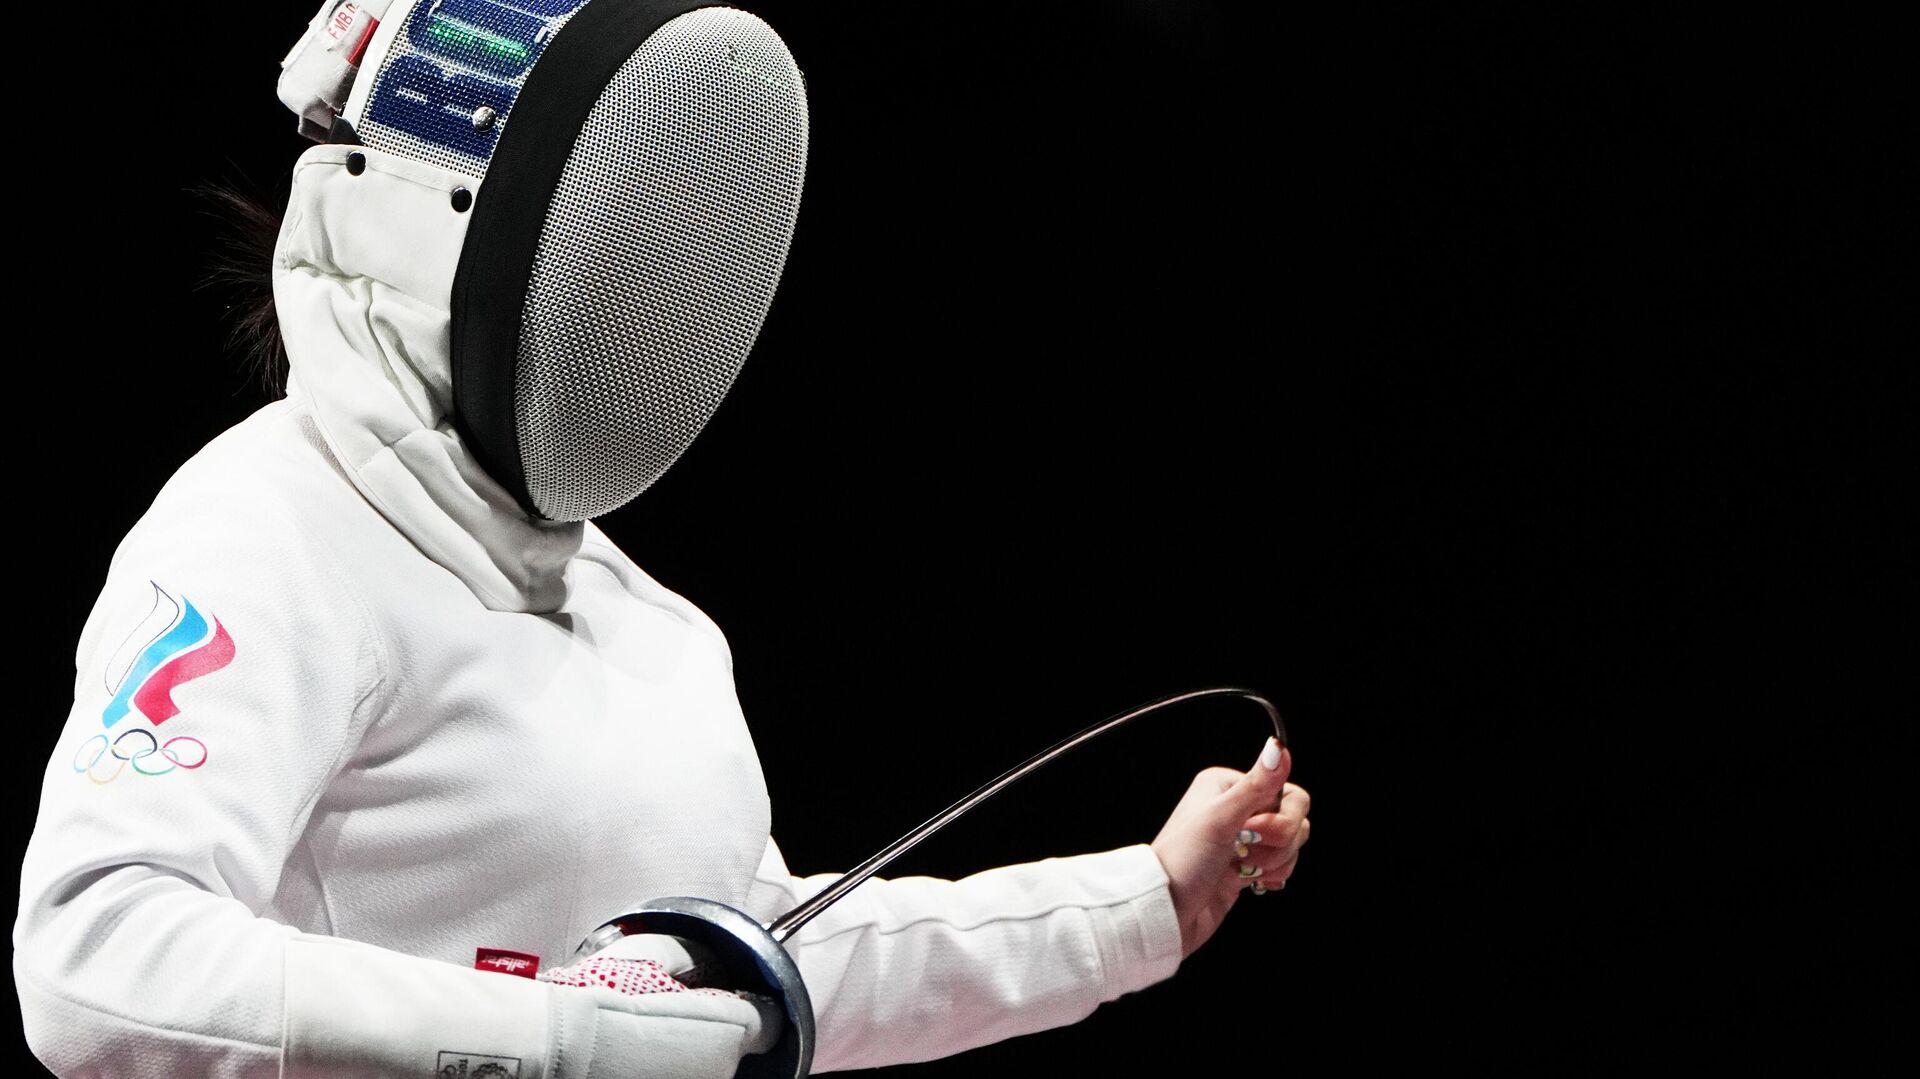 Олимпиада-2020. Фехтование. Женщины. Шпага - РИА Новости, 1920, 24.07.2021